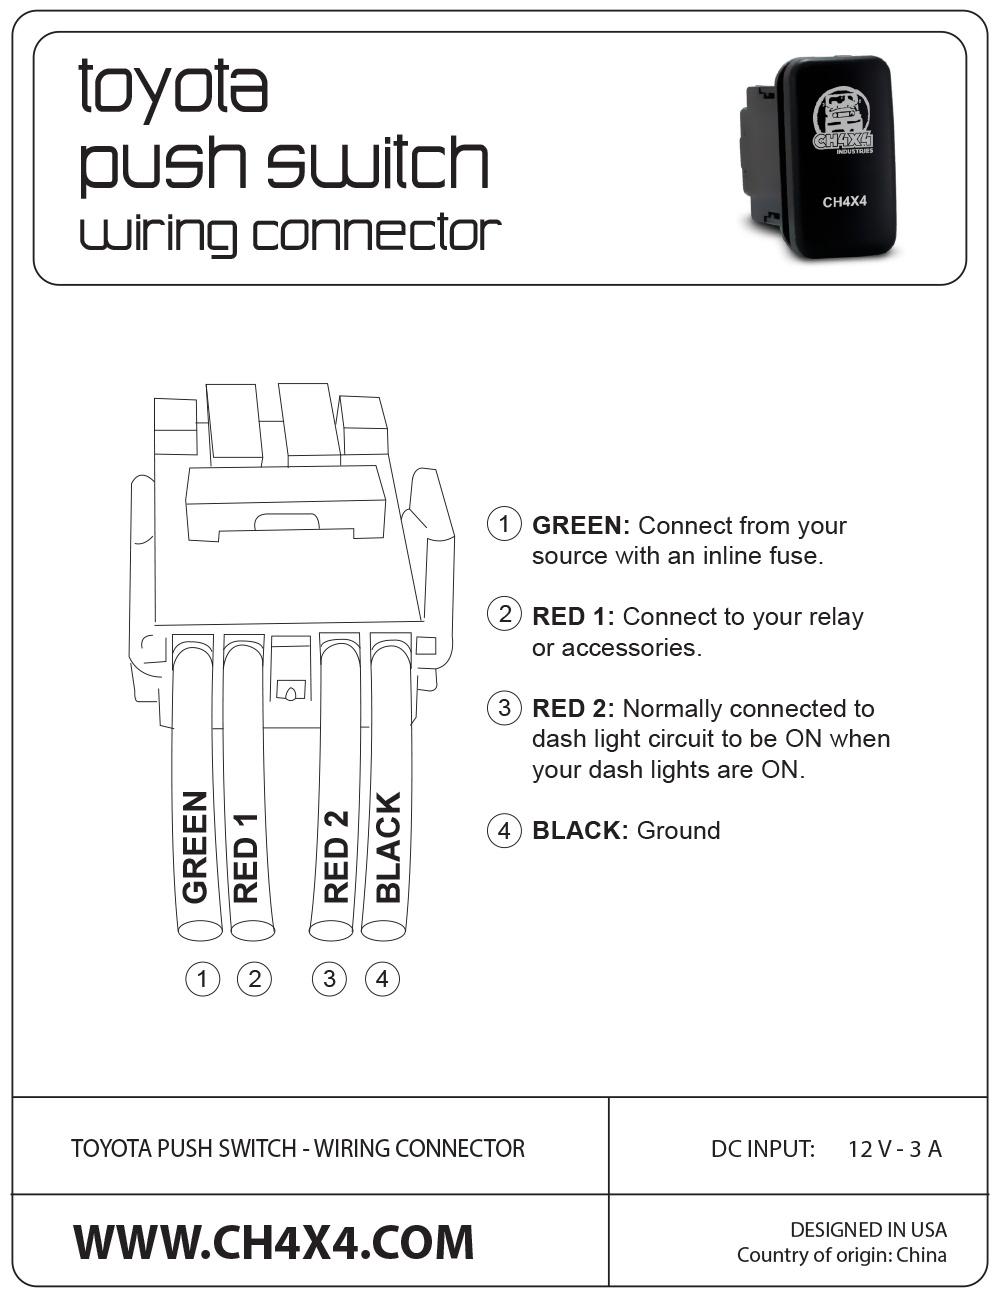 Wiring SPOD to CH4x4 Toyota Push Button Switches | Toyota FJ Cruiser Forum | Spod Se Wiring Diagram |  | Toyota FJ Cruiser Forum